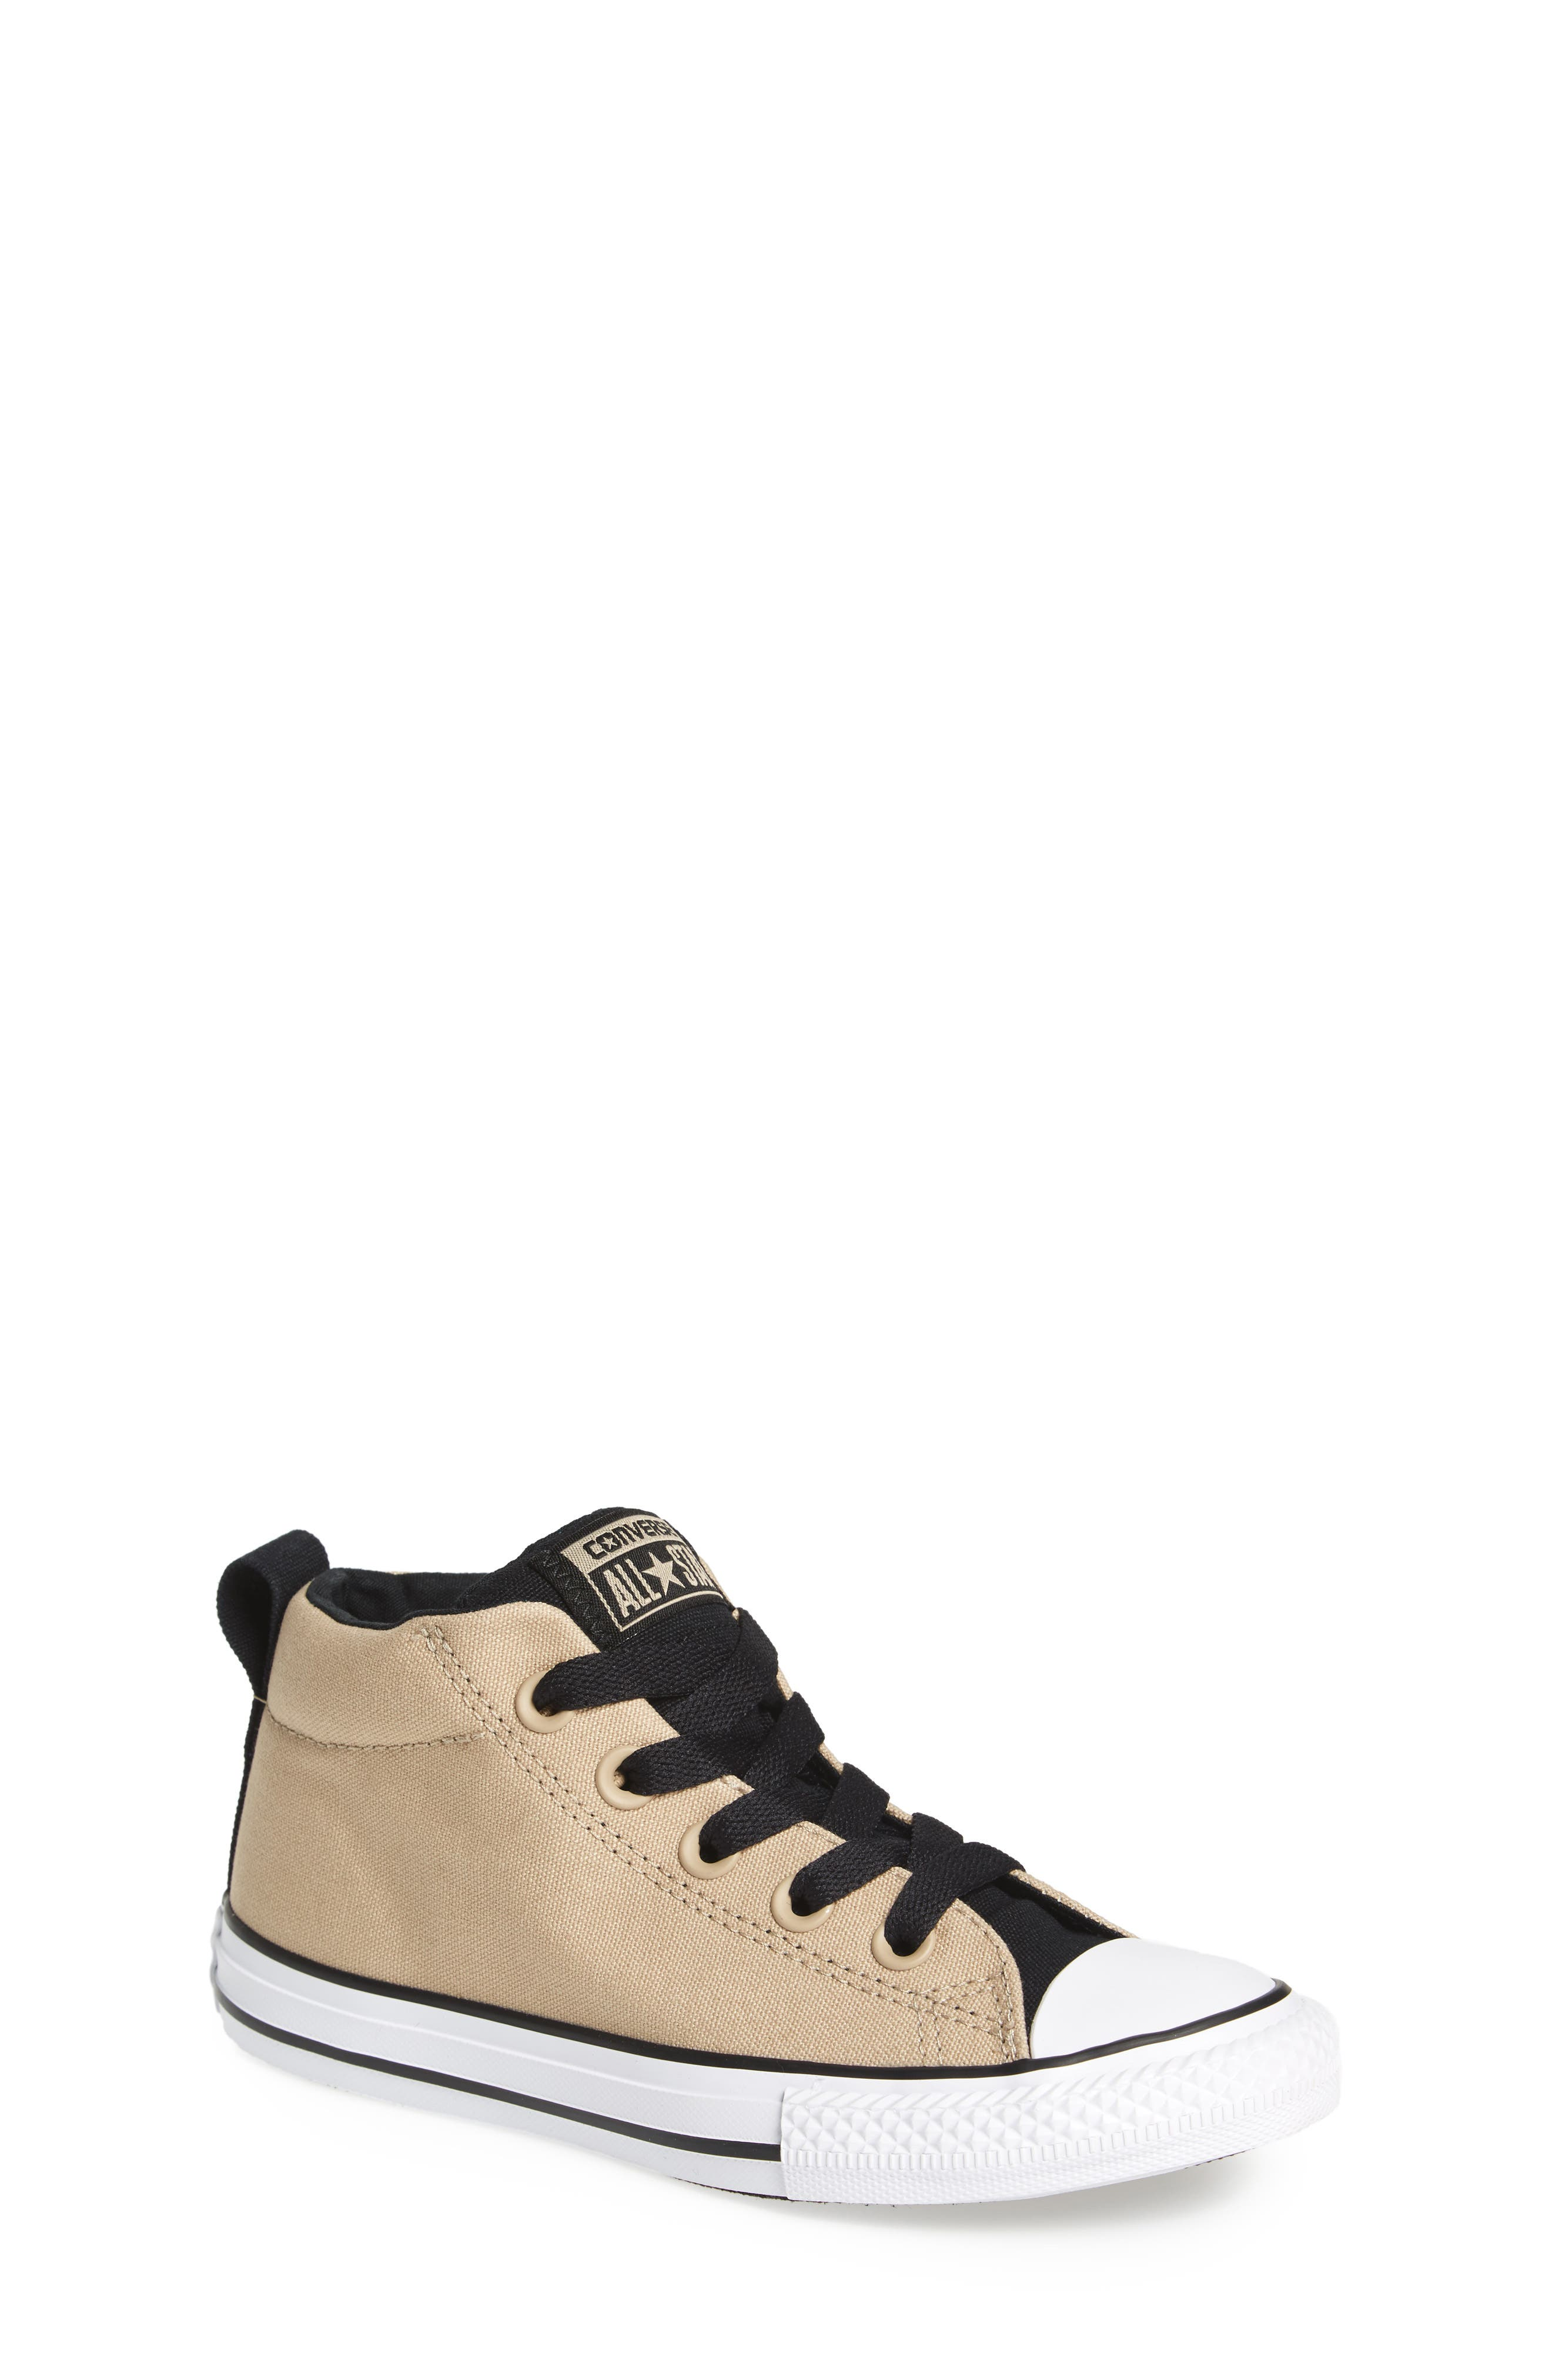 Converse Chuck Taylor® All Star® Street Mid Top Sneaker (Baby, Walker, Toddler, Little Kid & Big Kid)